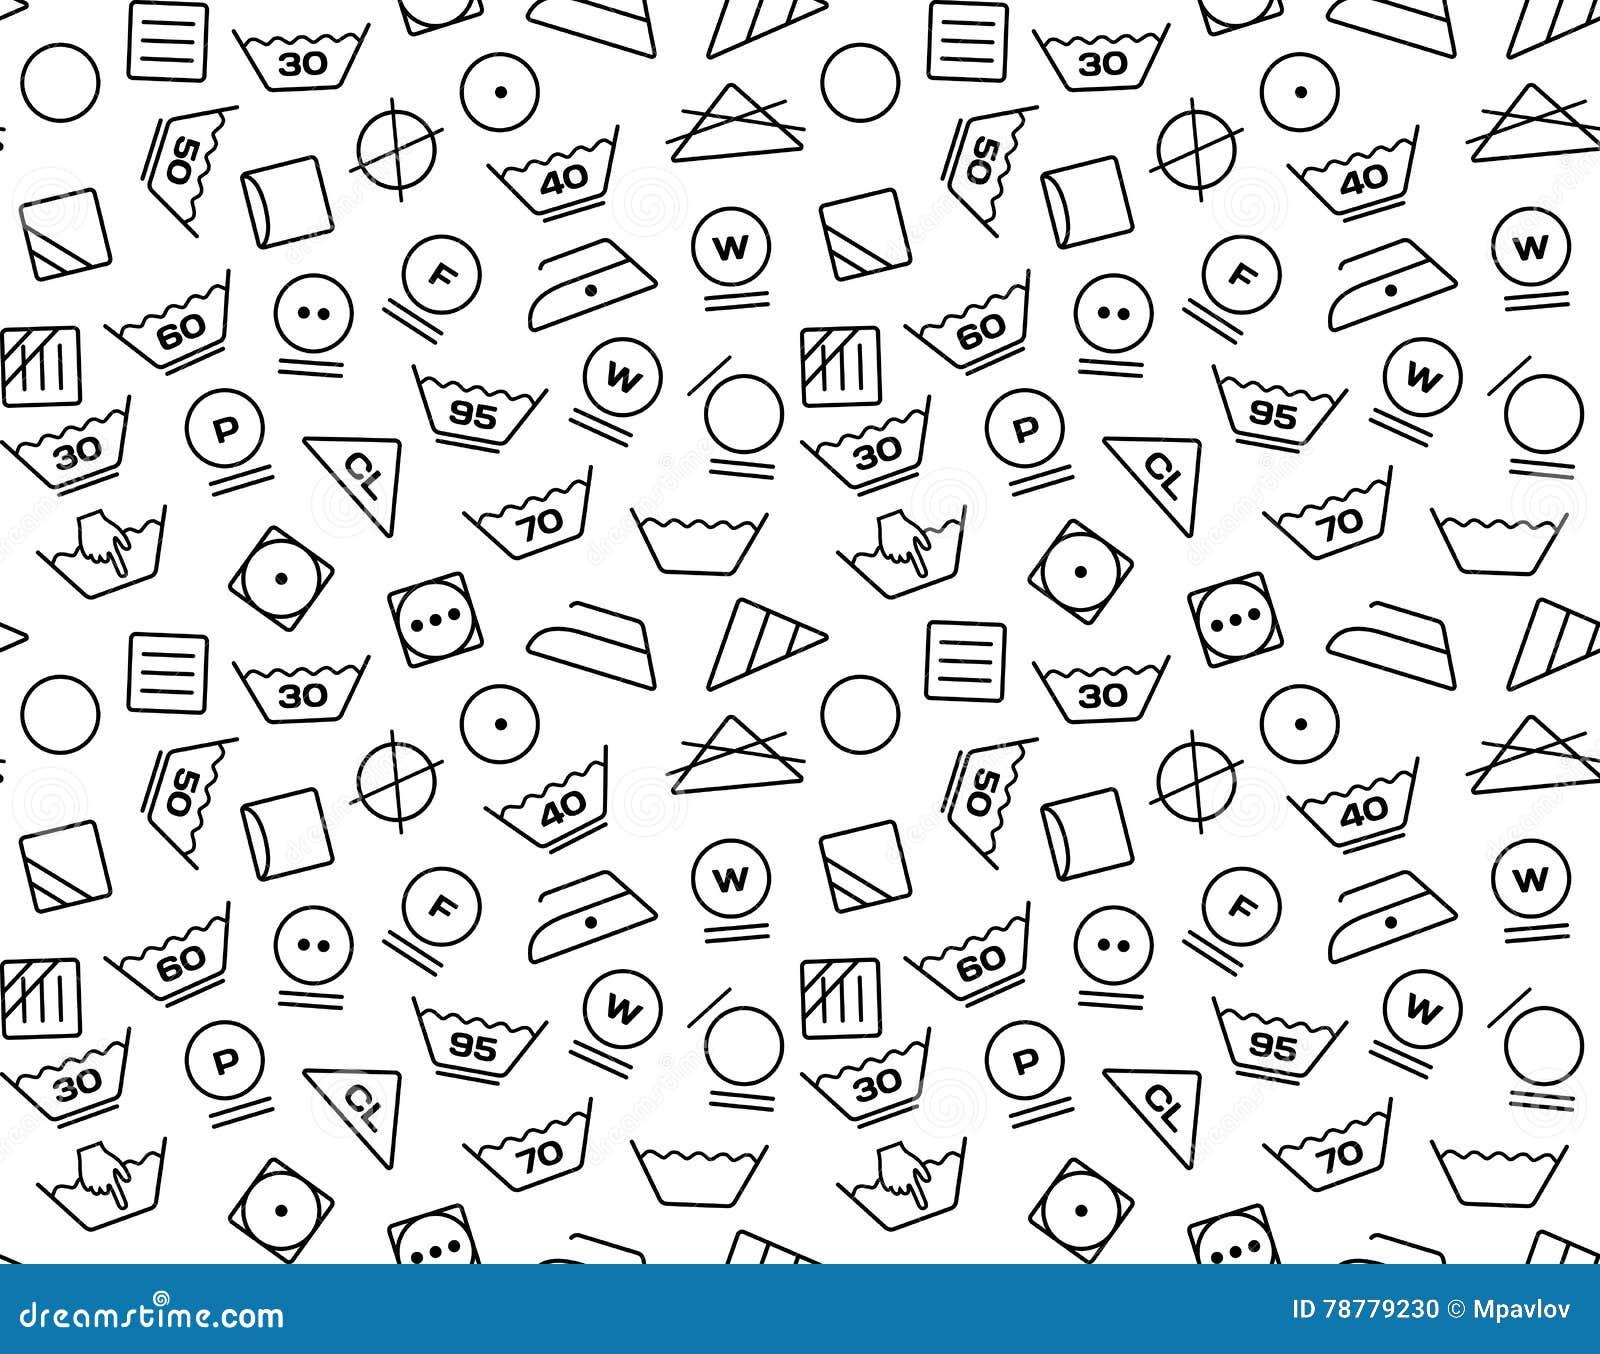 Pattern created from laundry washing symbols on a white background pattern created from laundry washing symbols on a white background symbol clothing biocorpaavc Images